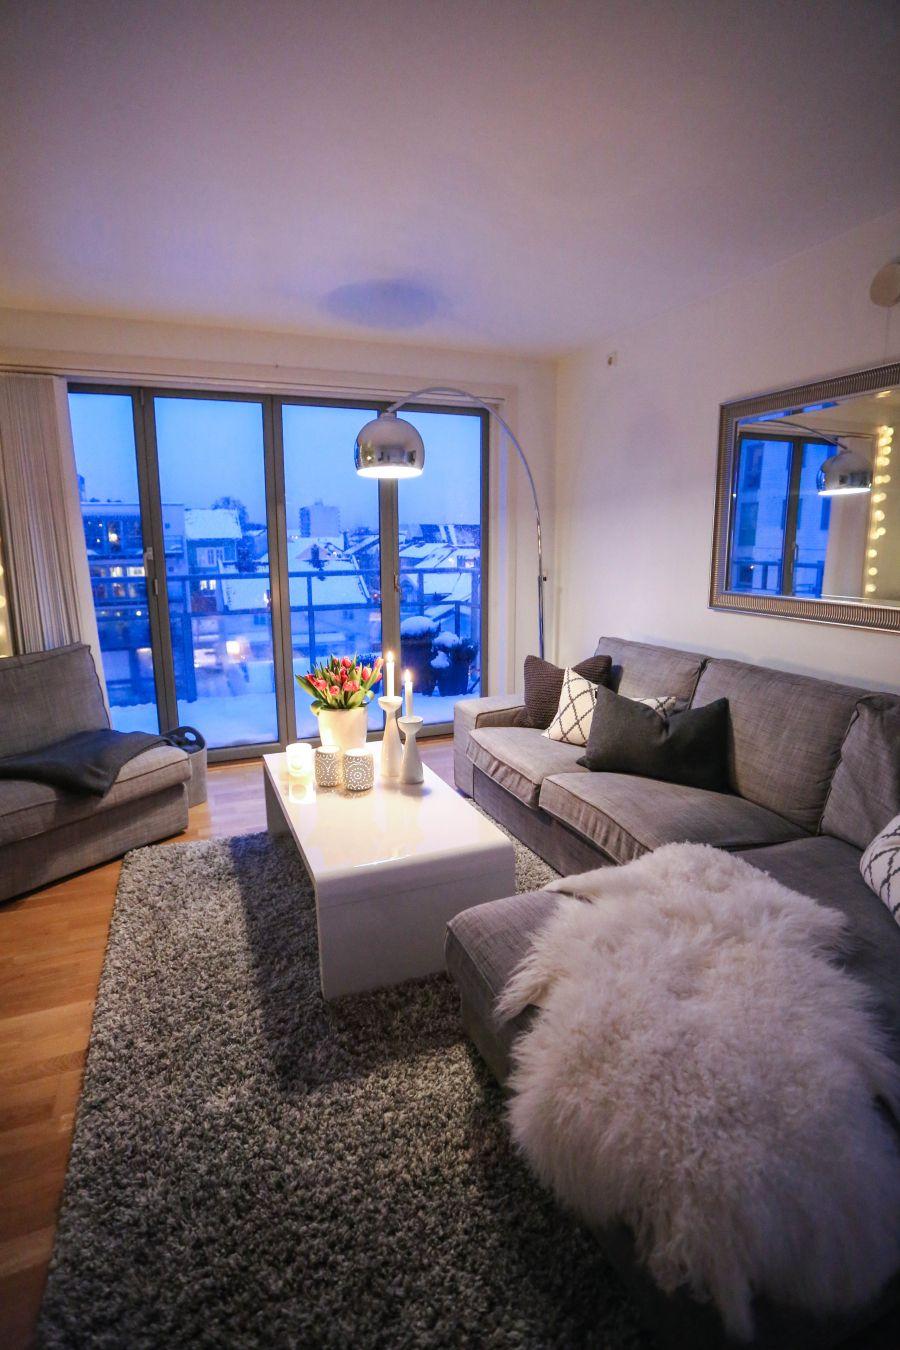 Living Room Design Ikea: Stue Leilighet, Interiør Design Stue